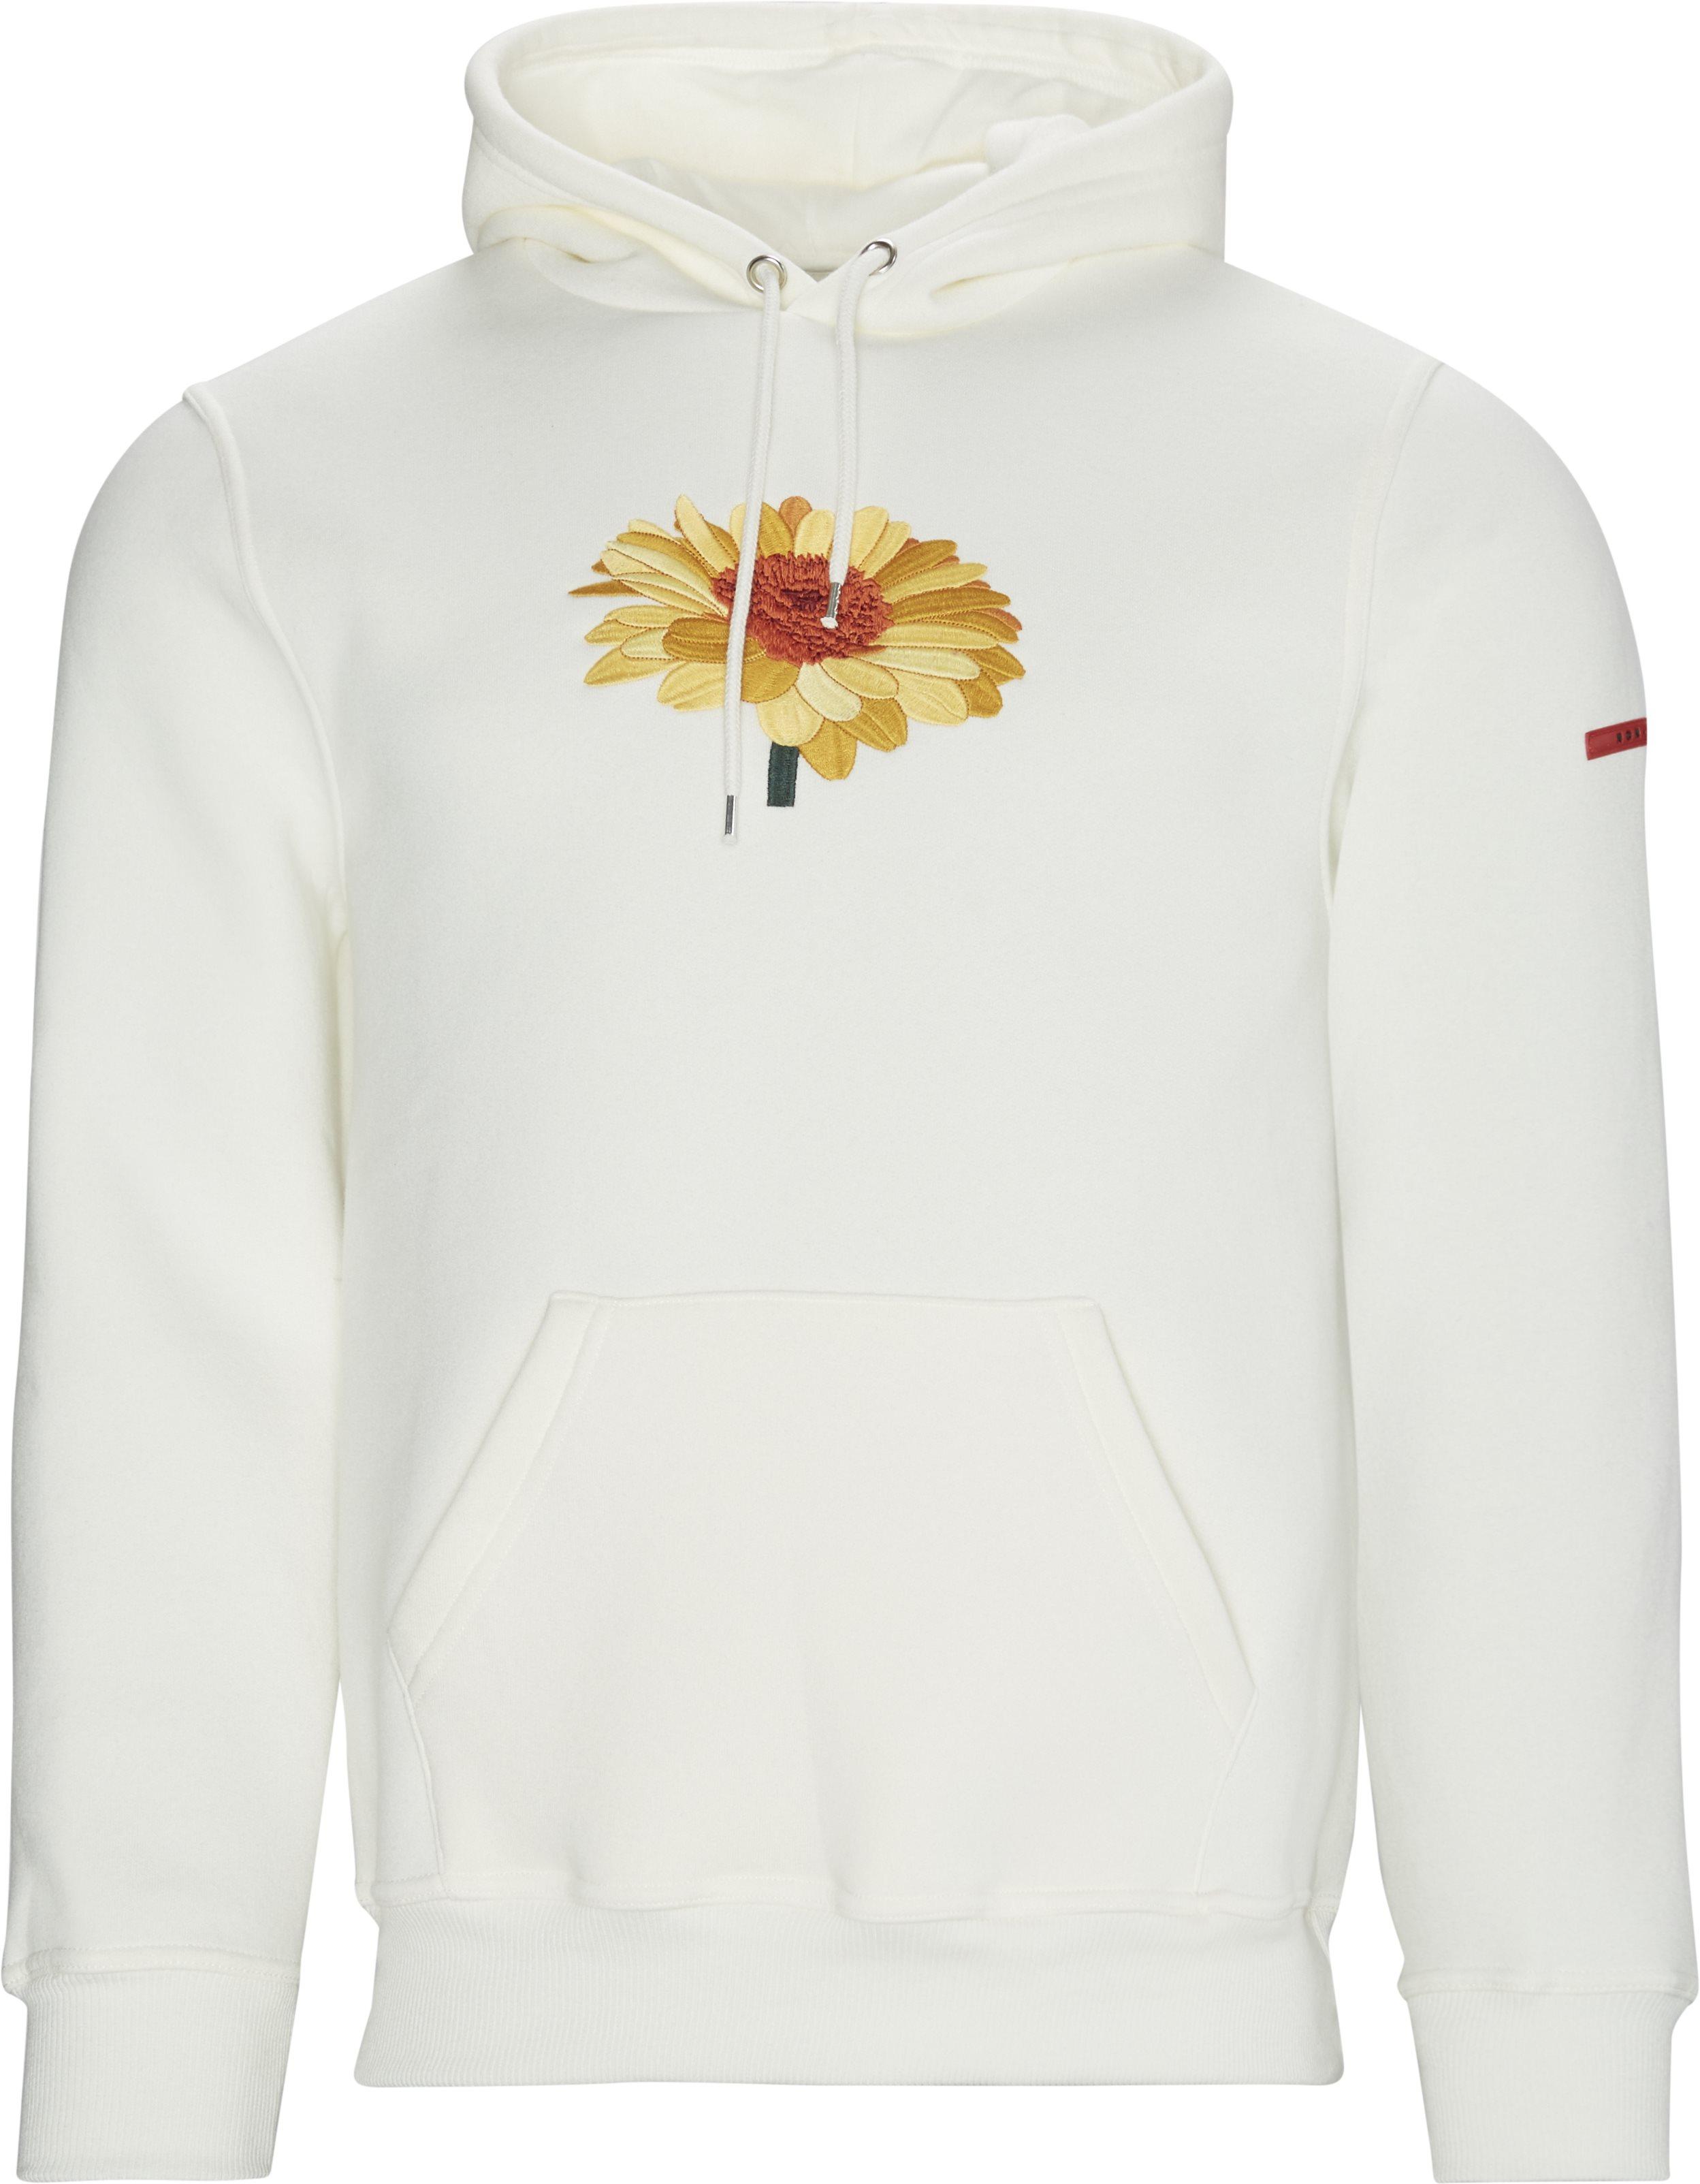 Sunflower Hoodie - Sweatshirts - Regular fit - Sand